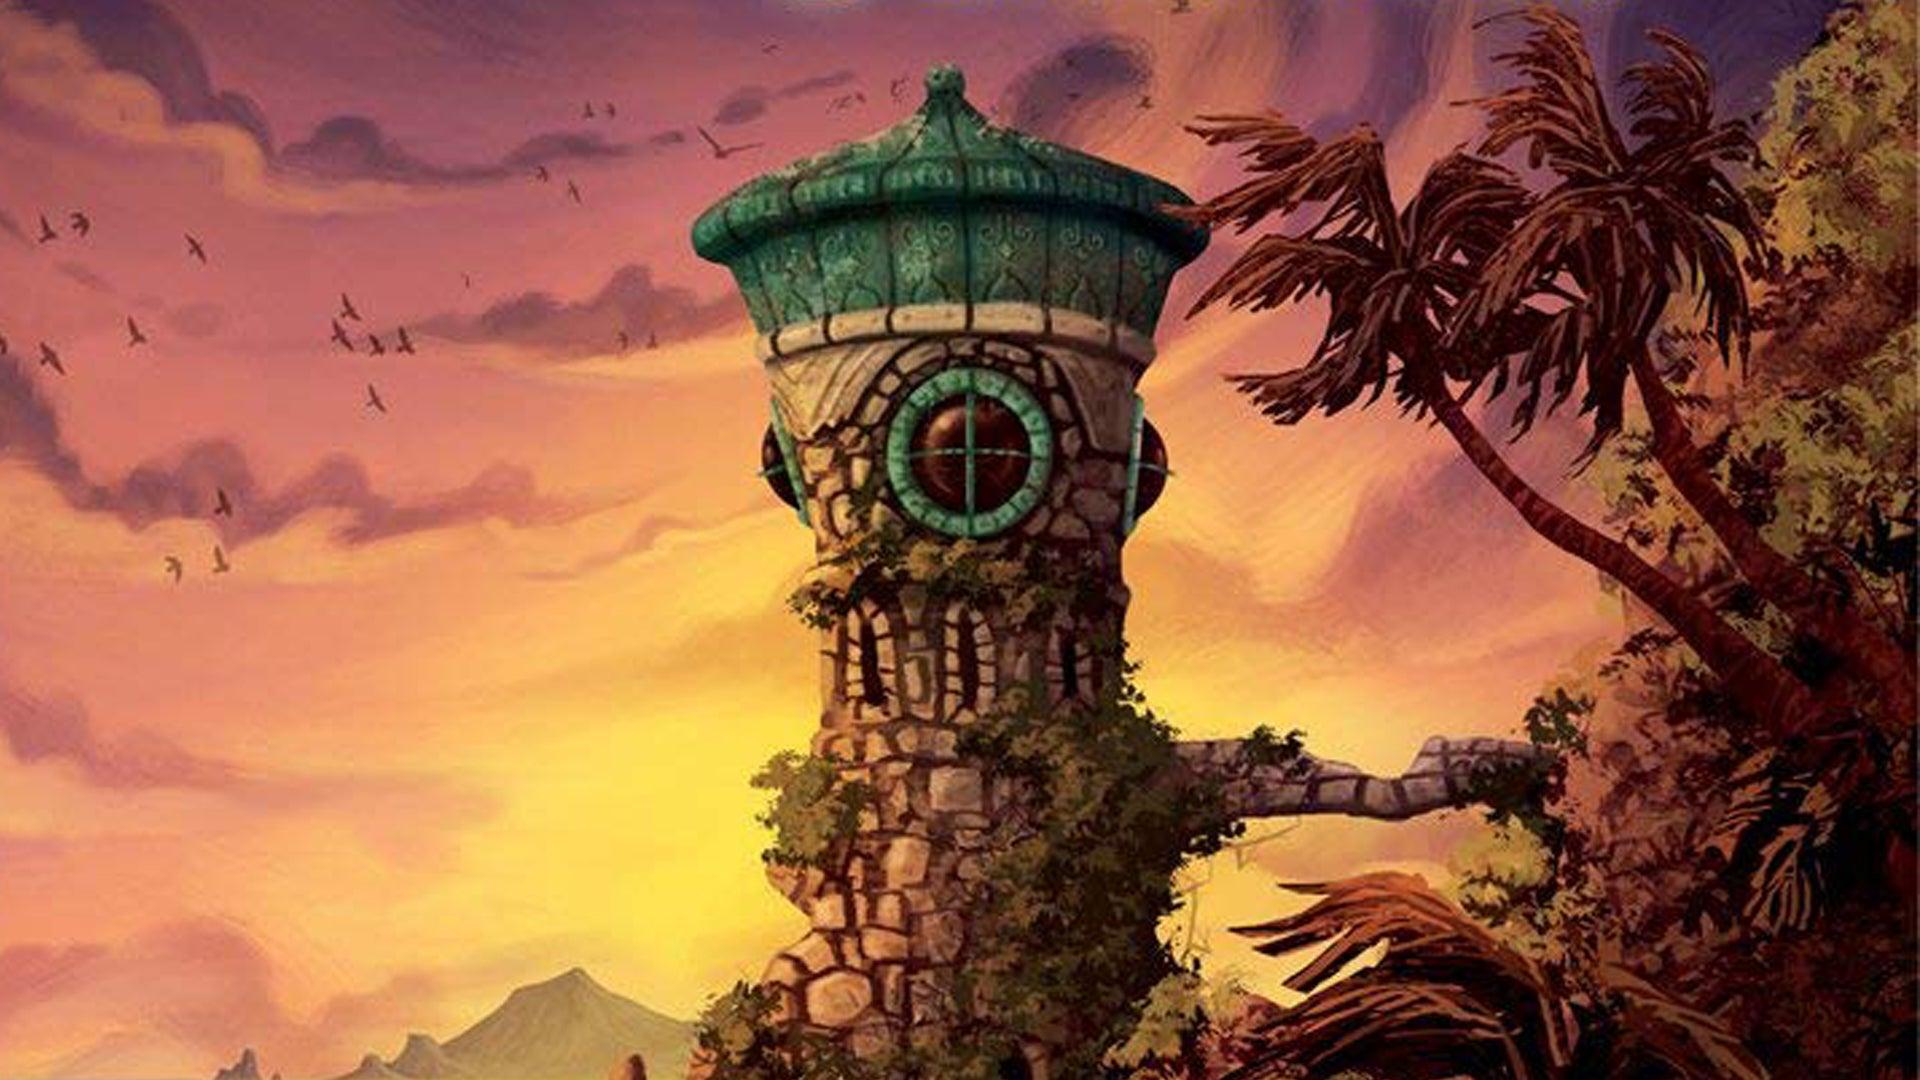 Forbidden Island board game artwork